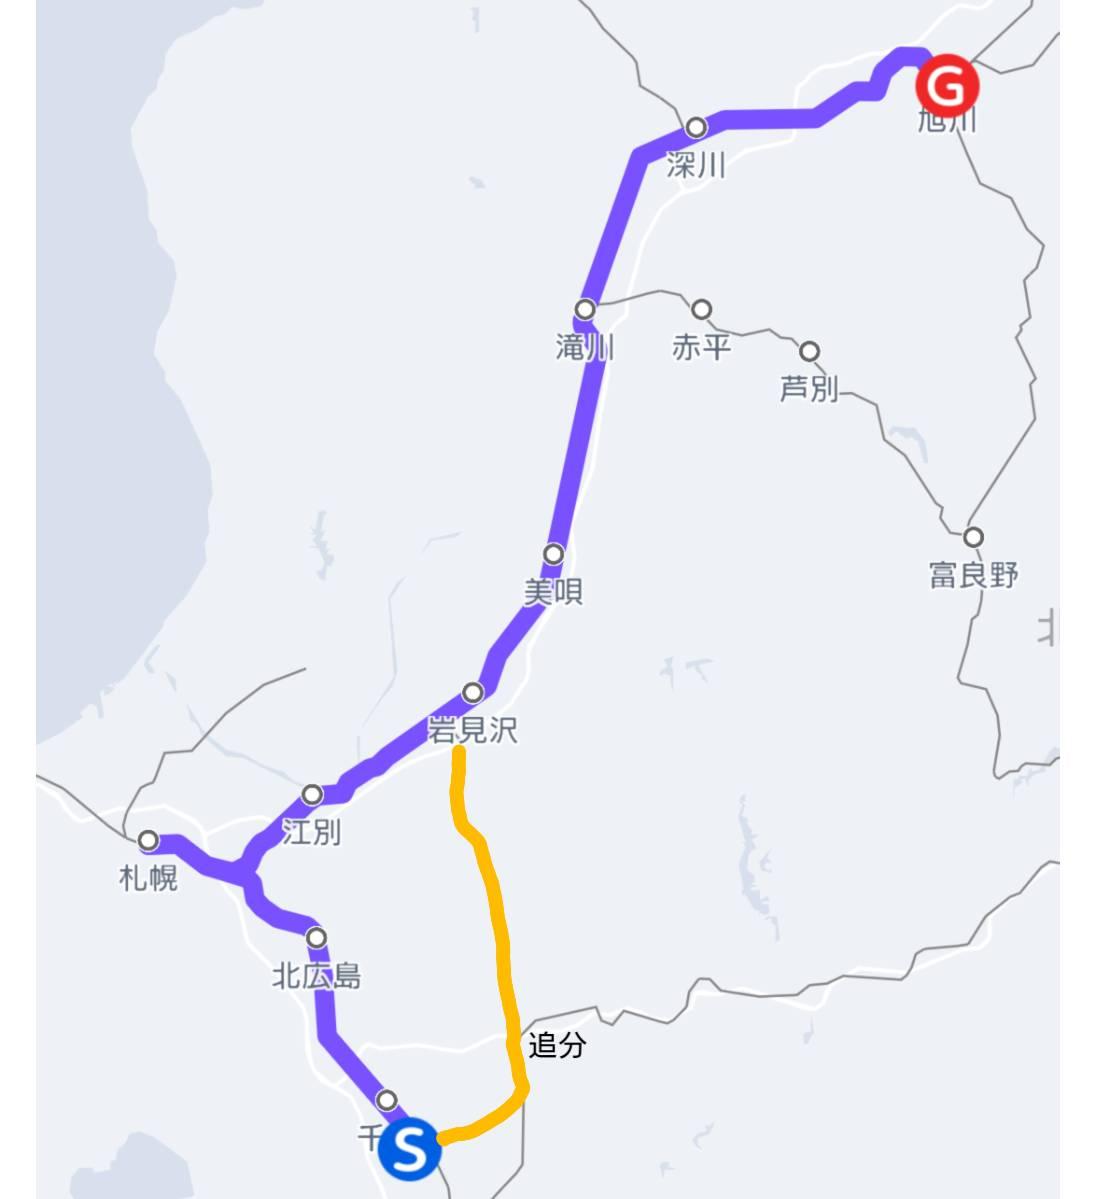 JR北海道・北海道エアポートが旭川駅~新千歳空港駅を結ぶ直通列車を計画 追分経由で1時間30分